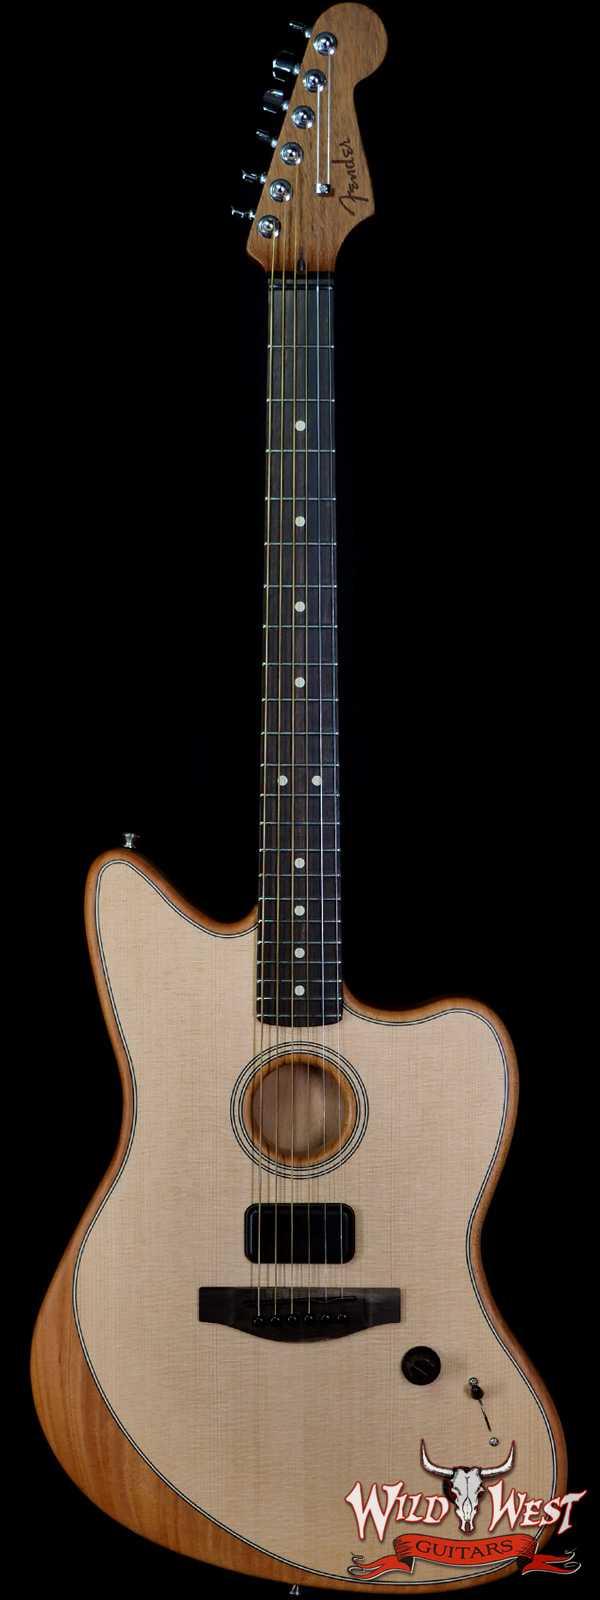 Fender American Acoustasonic Jazzmaster Ebony Fingerboard Natural